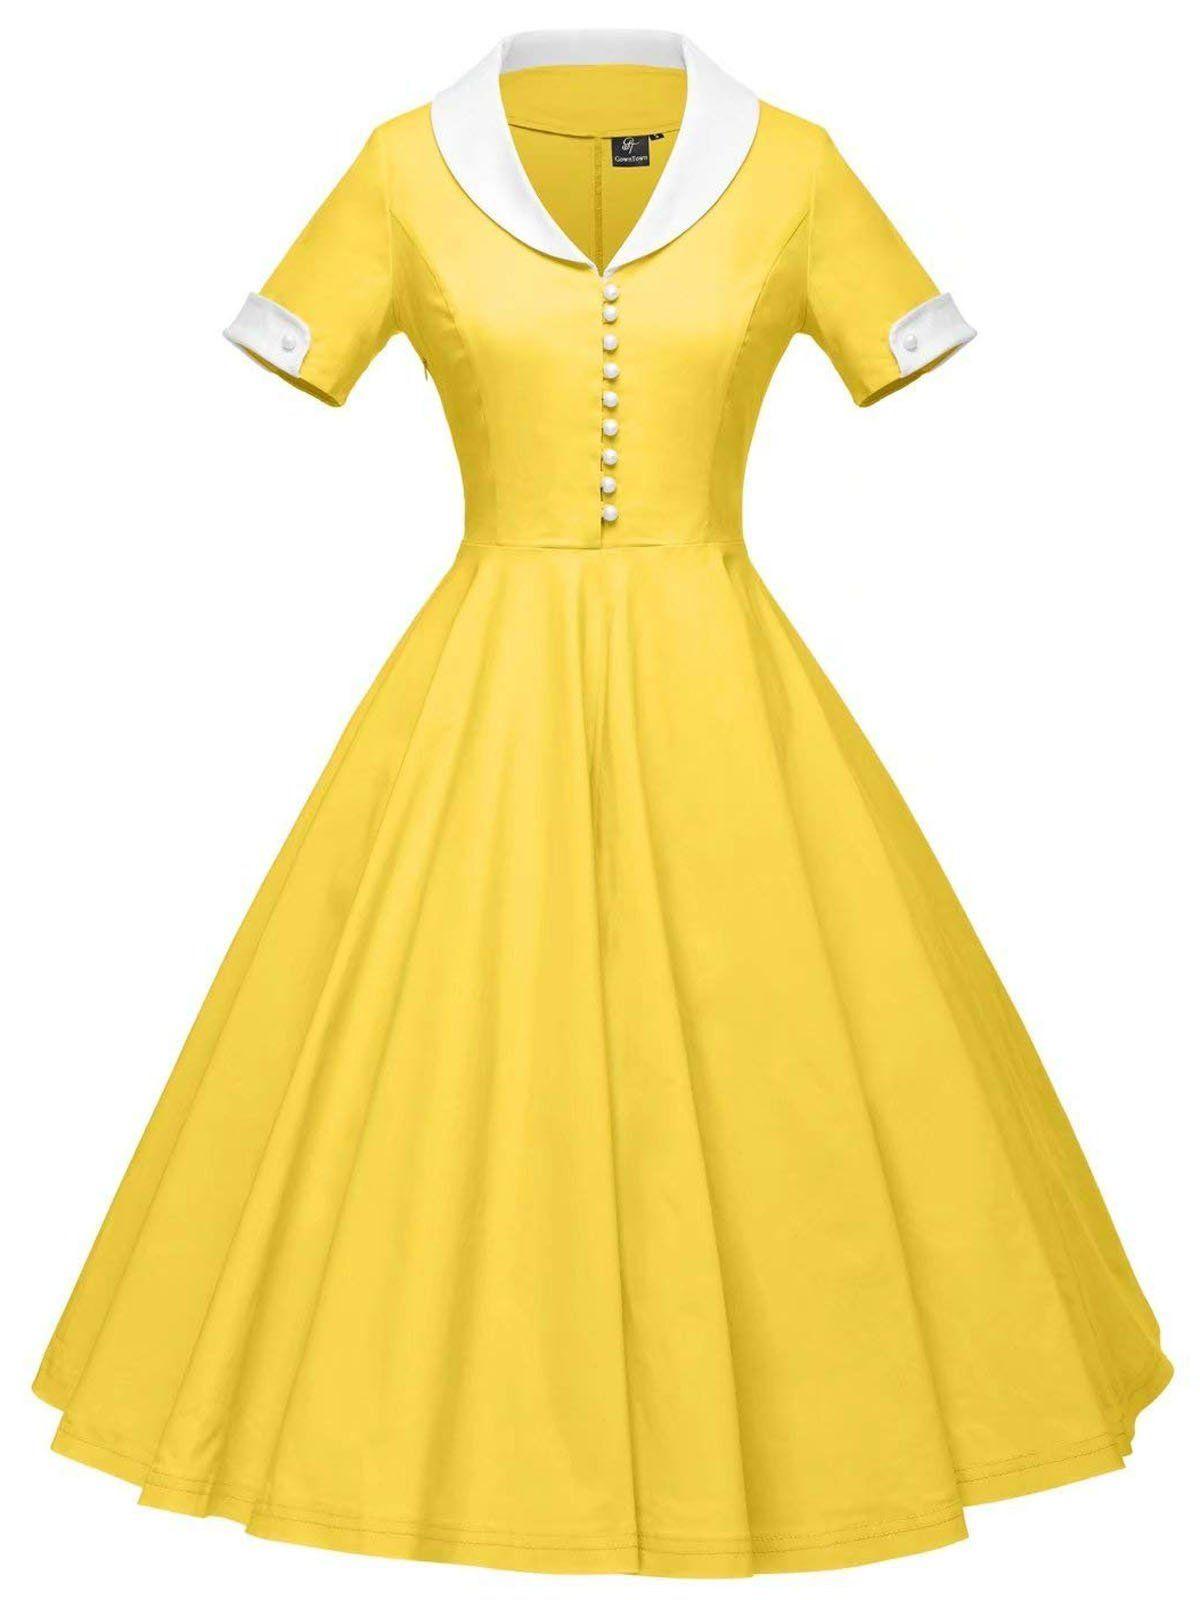 1950s Solid Turndown Collar Swing Dress Stretchy Dress Retro Dress Womens Dresses [ 1600 x 1200 Pixel ]